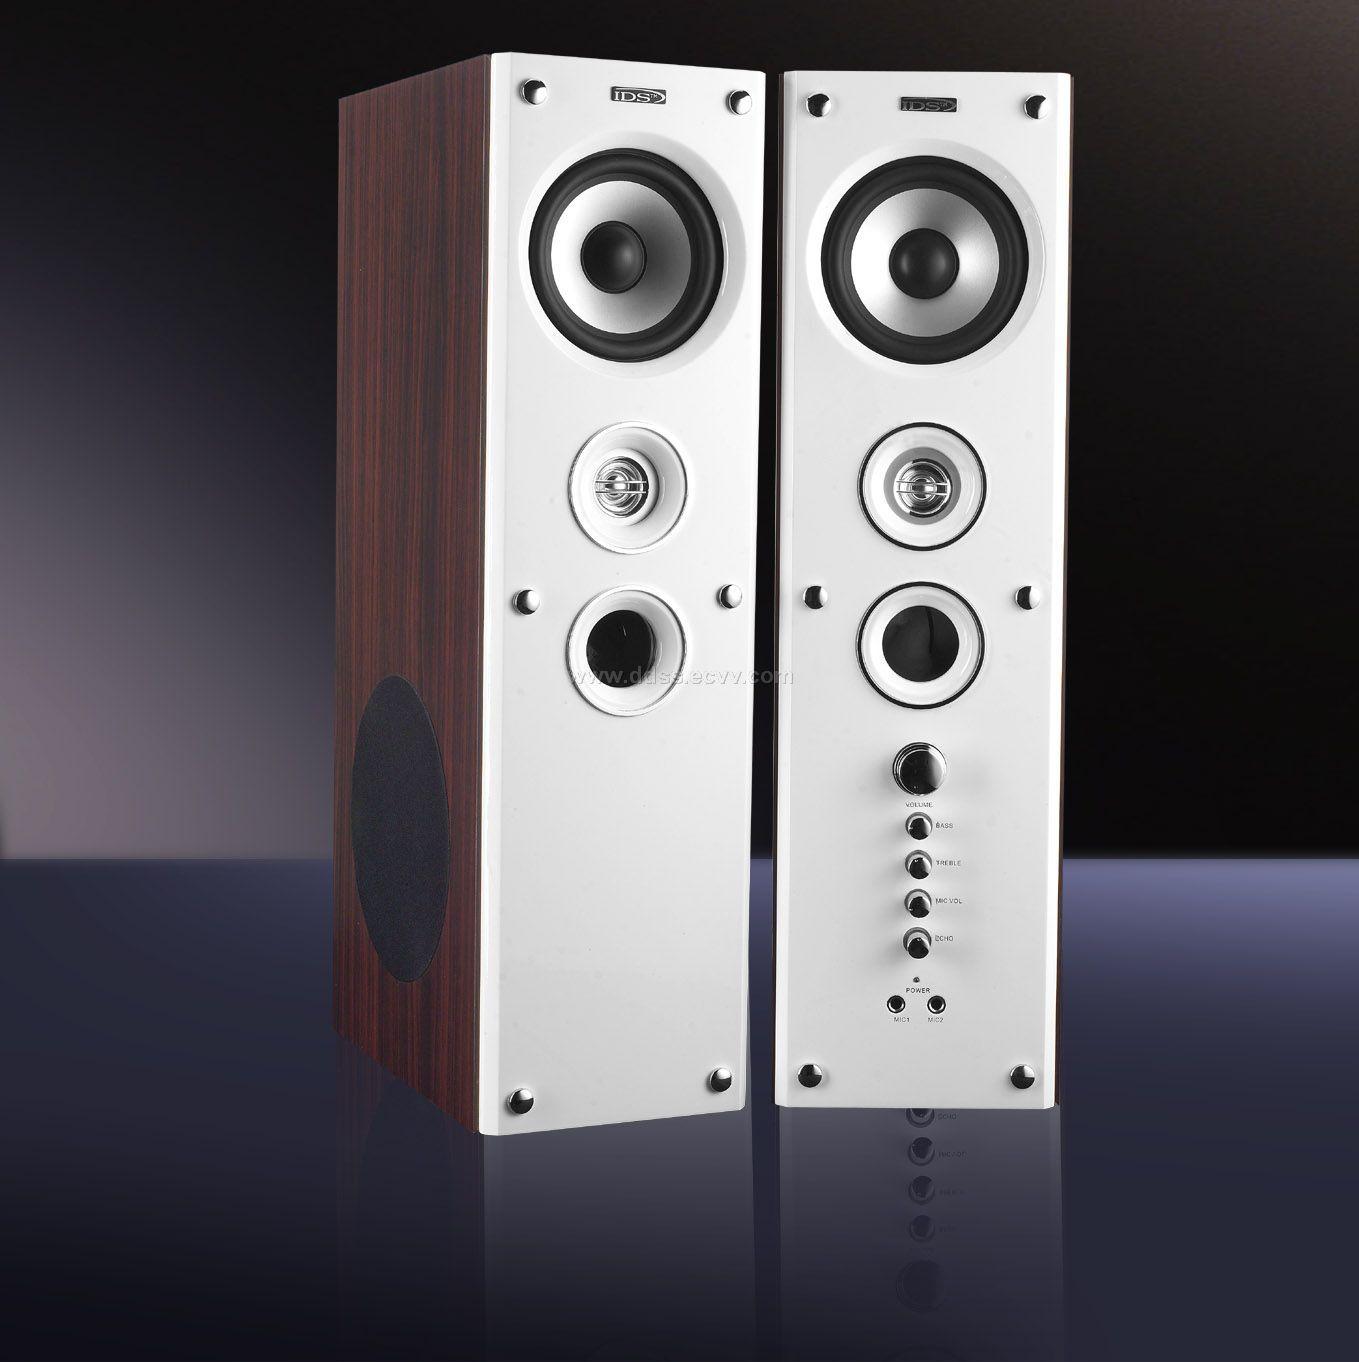 Samsung Ht E350k 5 1 Home Theatre System